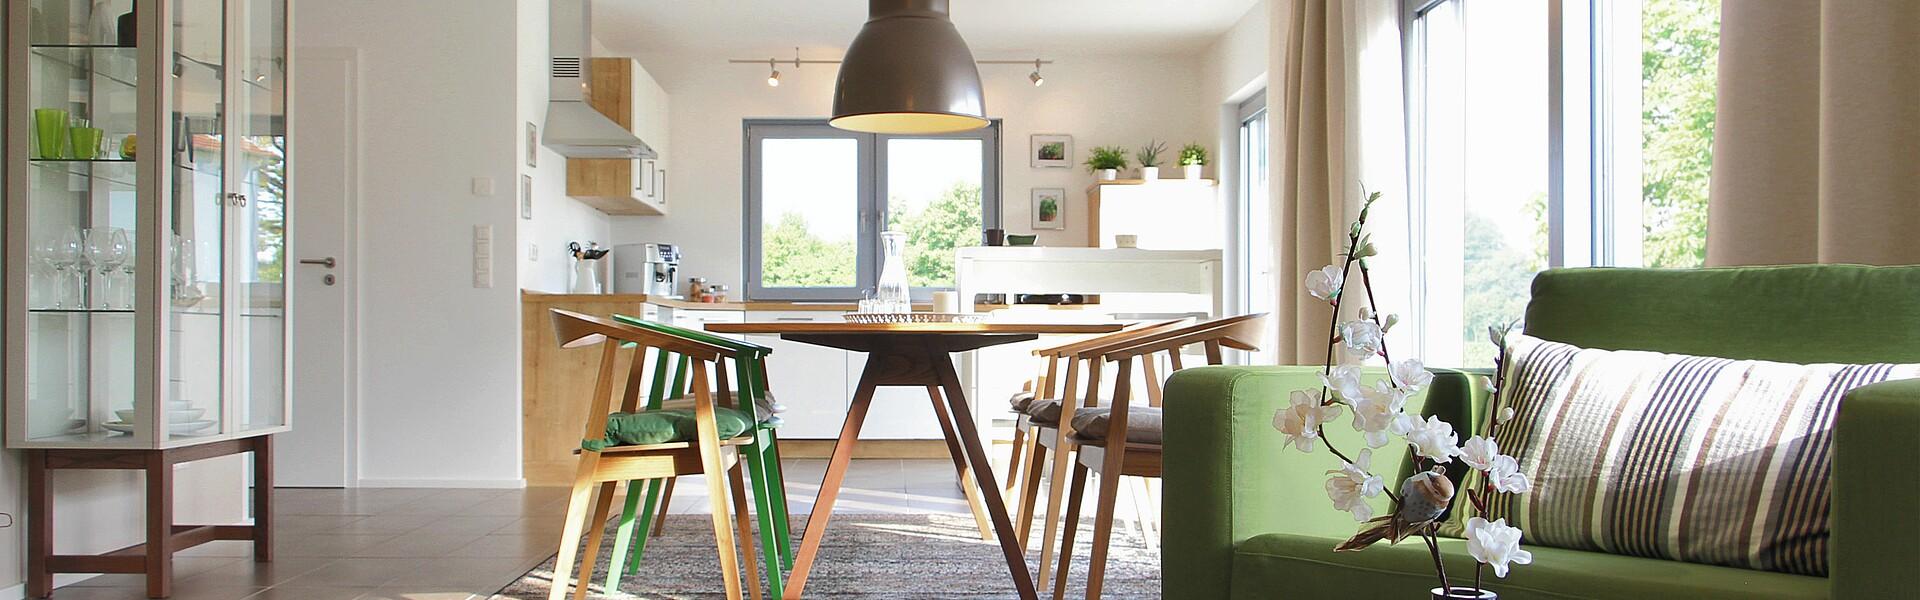 fertighaus variant 25 183 hanse haus. Black Bedroom Furniture Sets. Home Design Ideas